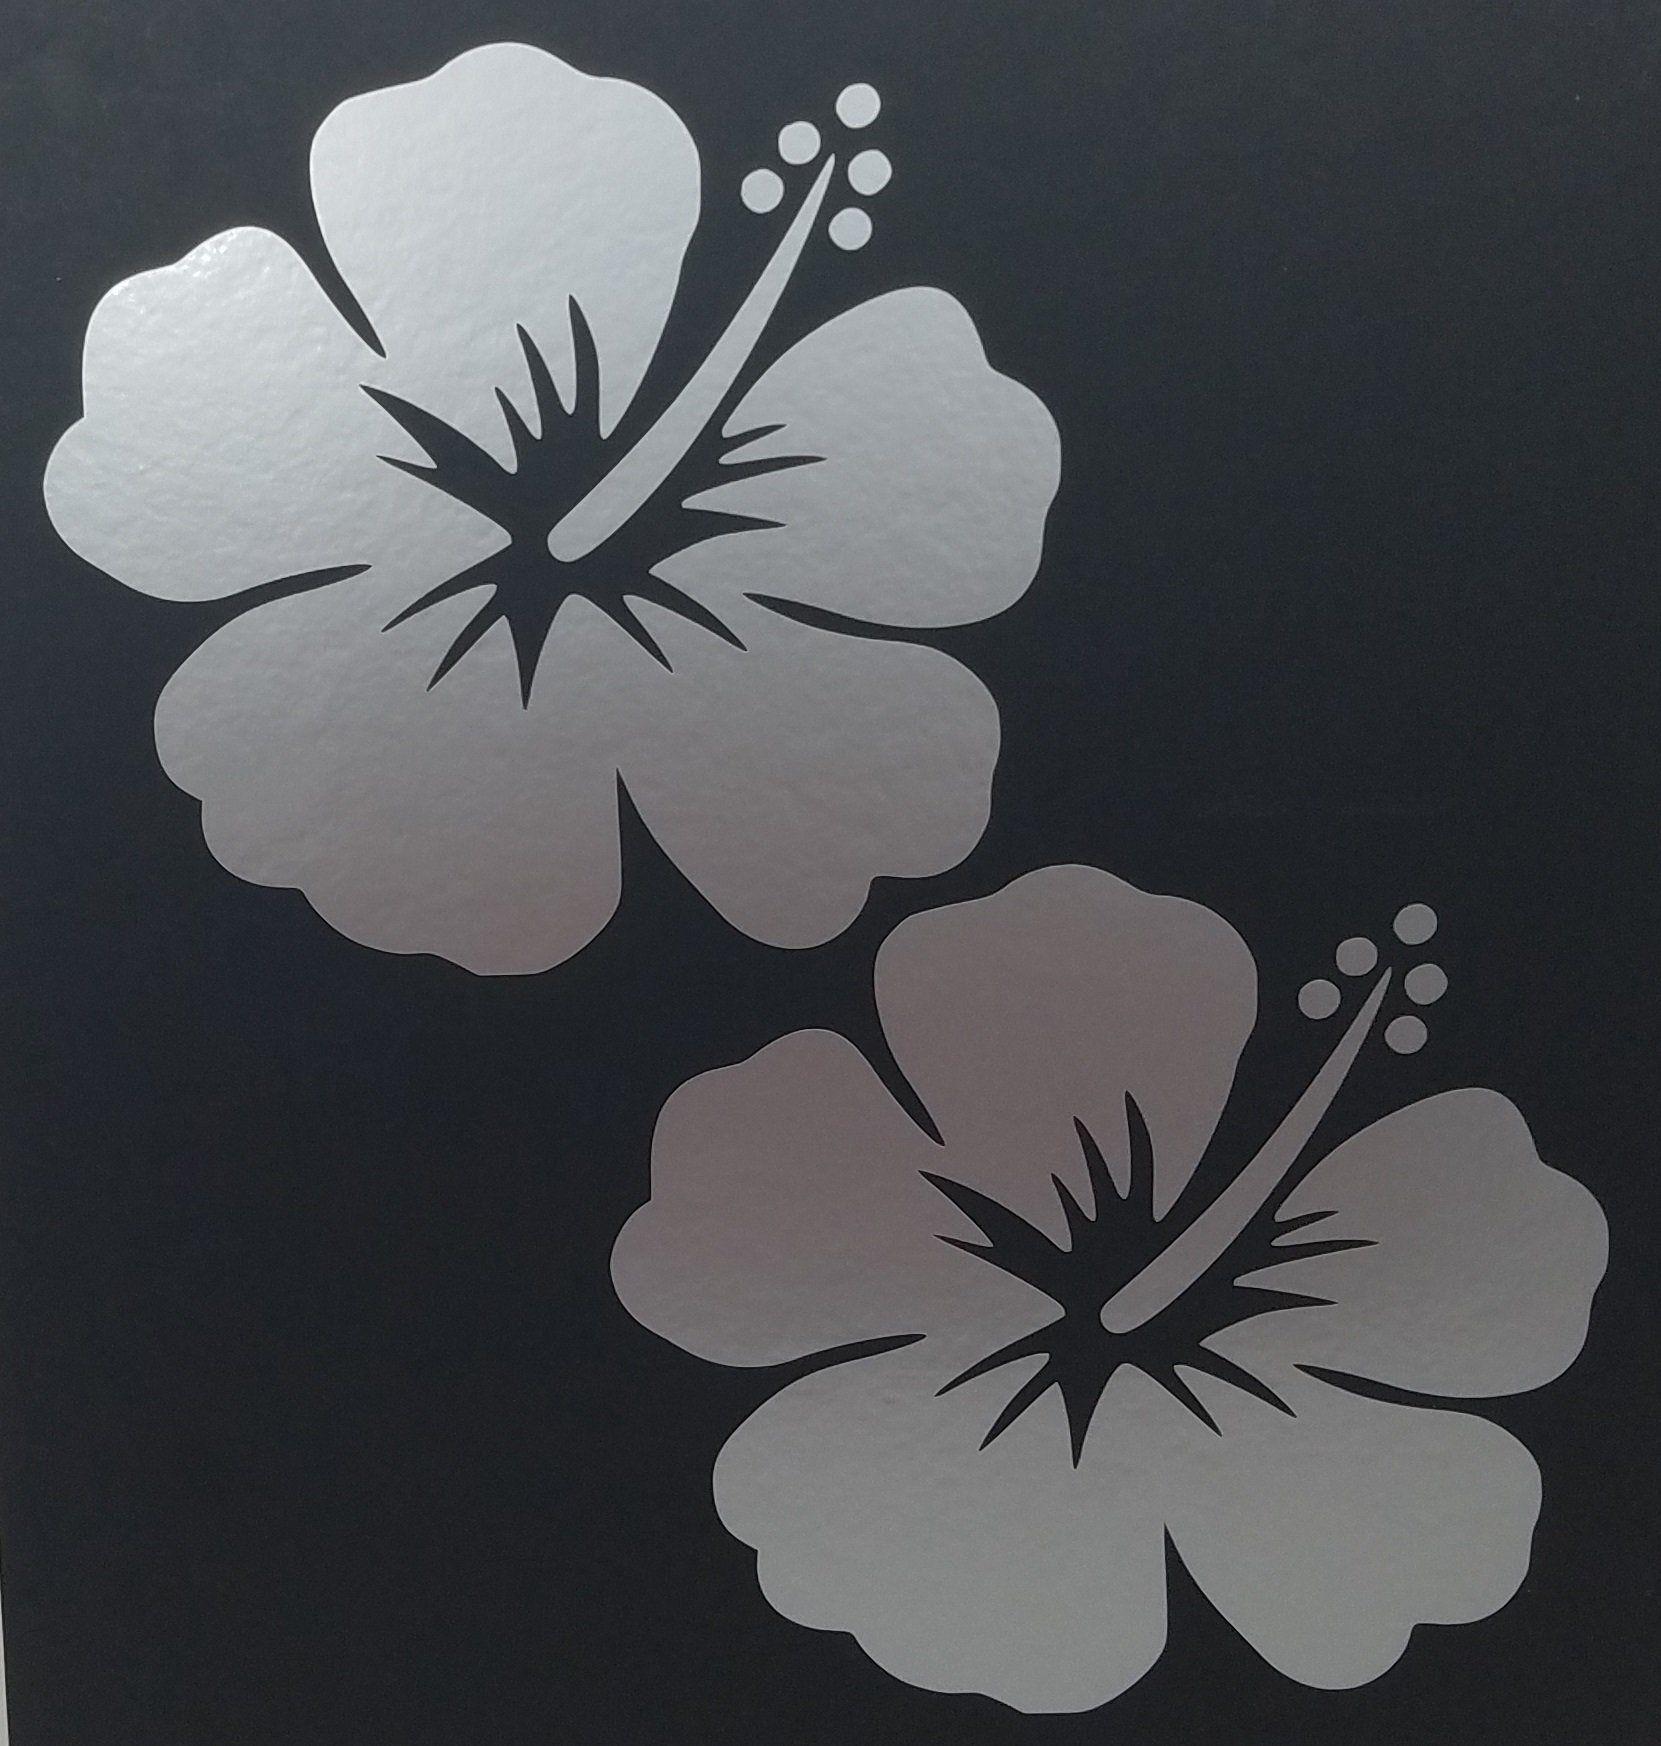 Betty Boop Aloha Girl Hawaiian Hibiscus Flower Vinyl Decal Sticker